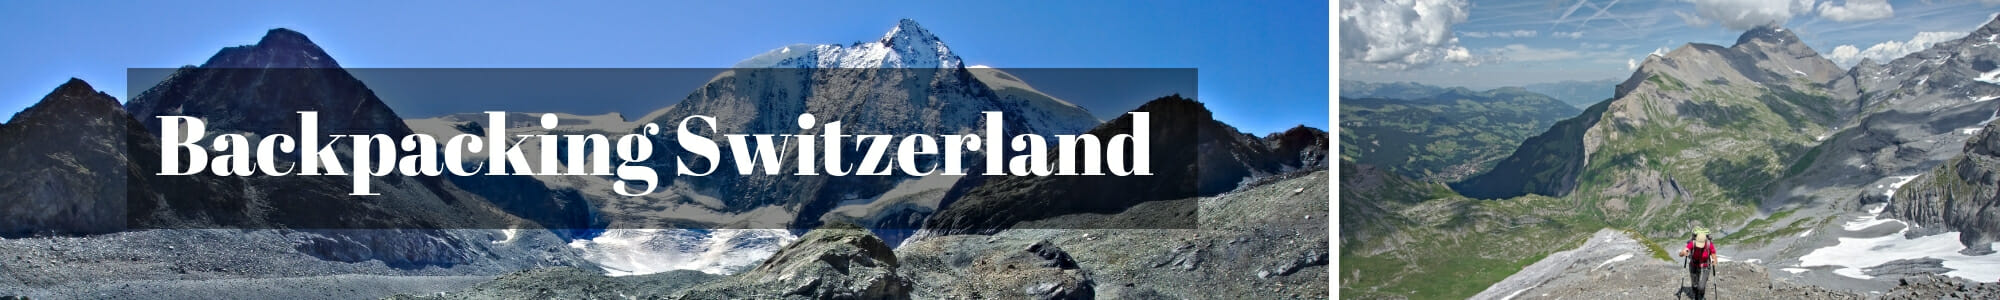 backpacking switzerland